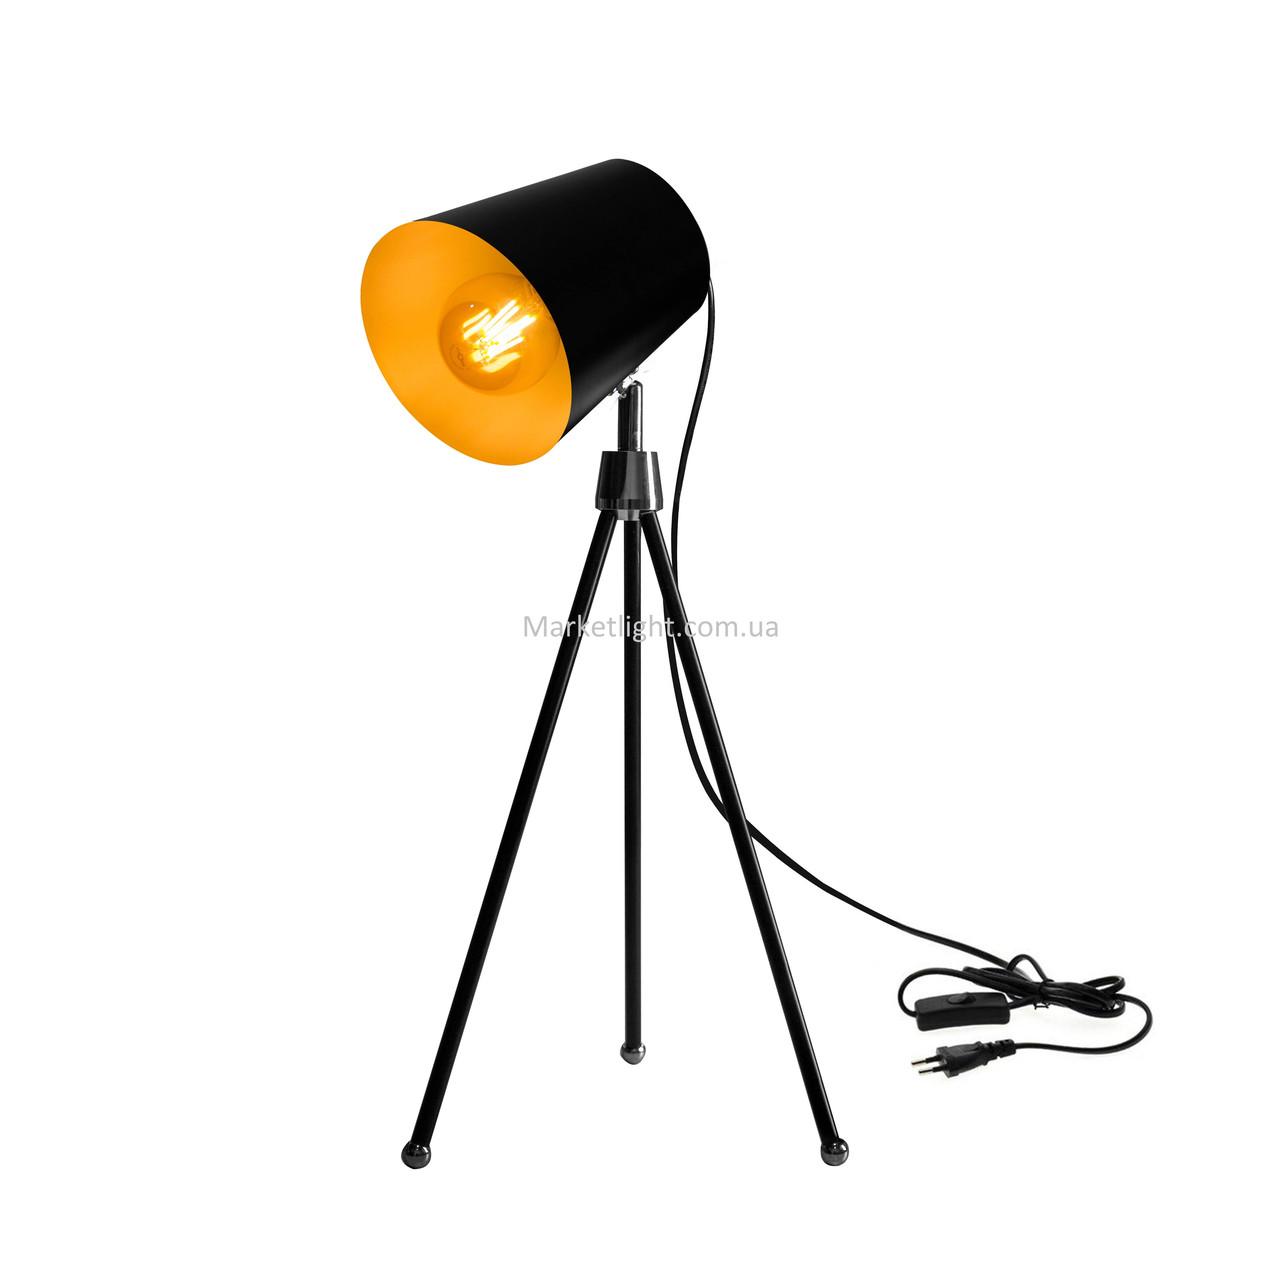 Настольная лампа в стиле лофт черная на ножках SWT-2038 BK